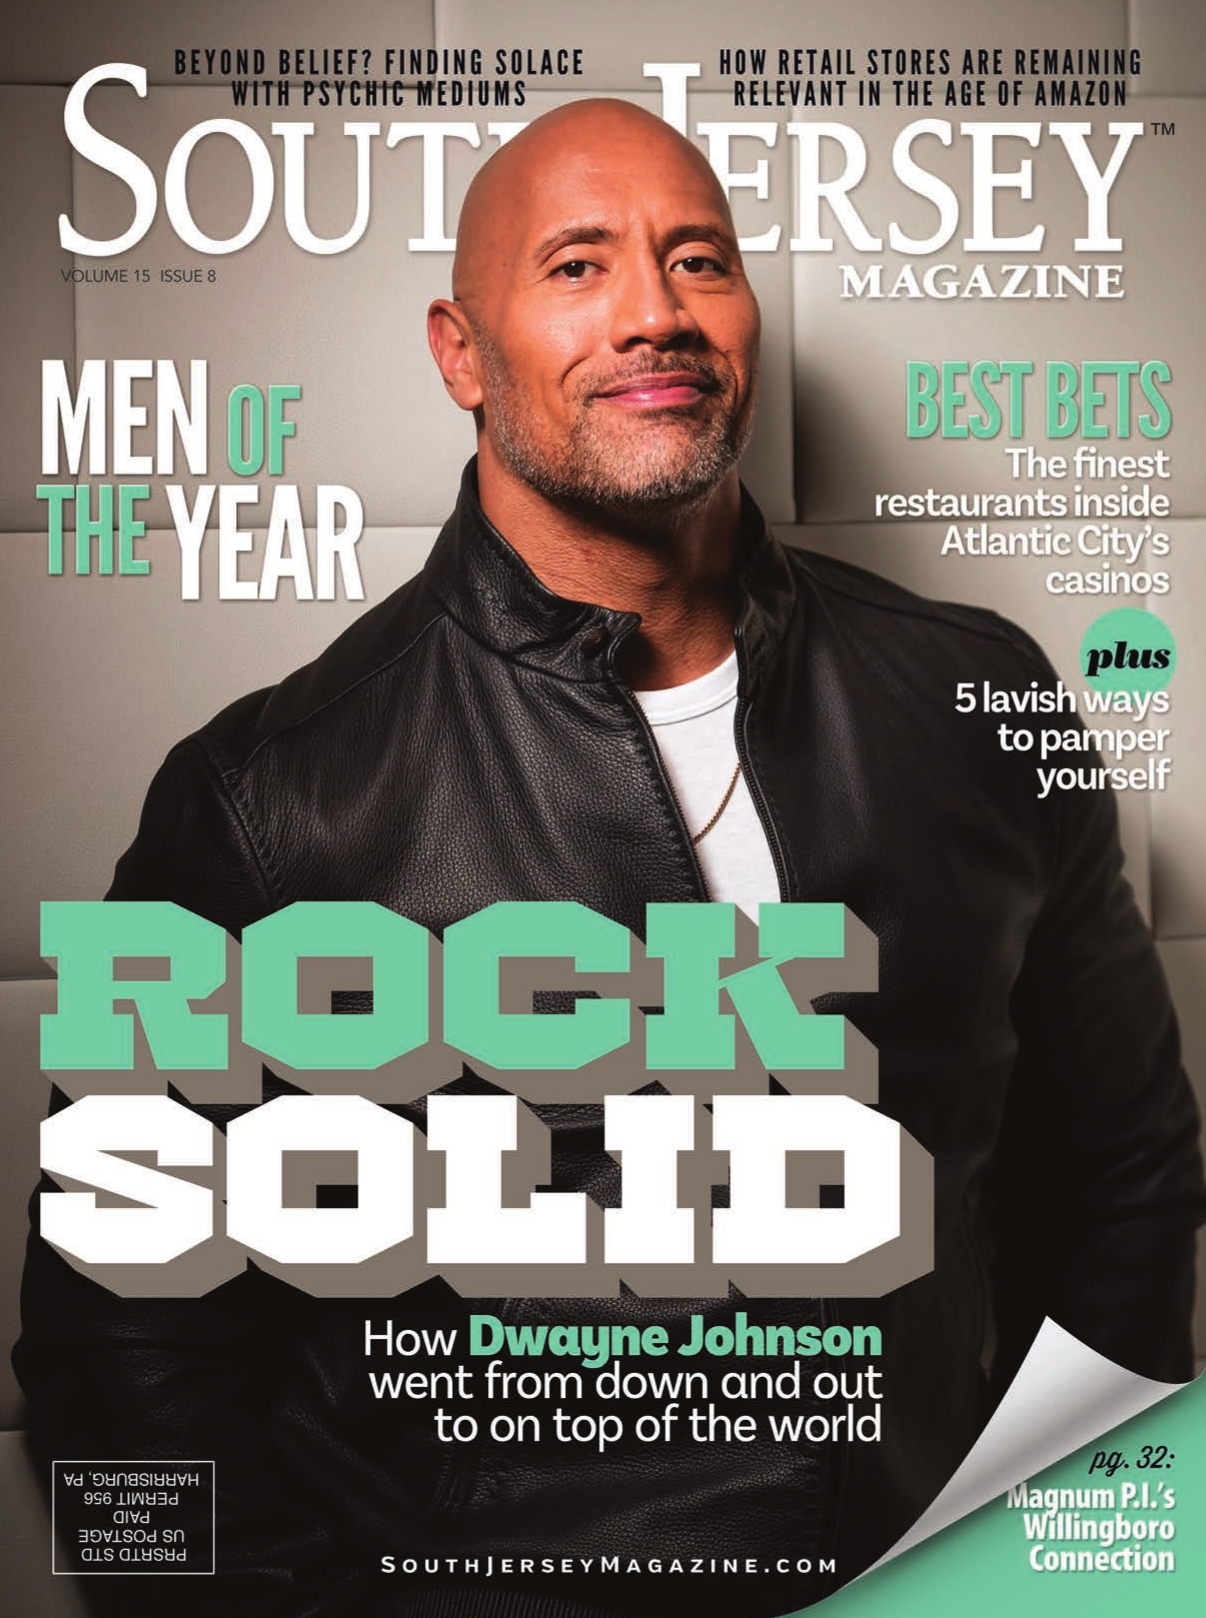 South Jersey Magazine November 2018 Issue